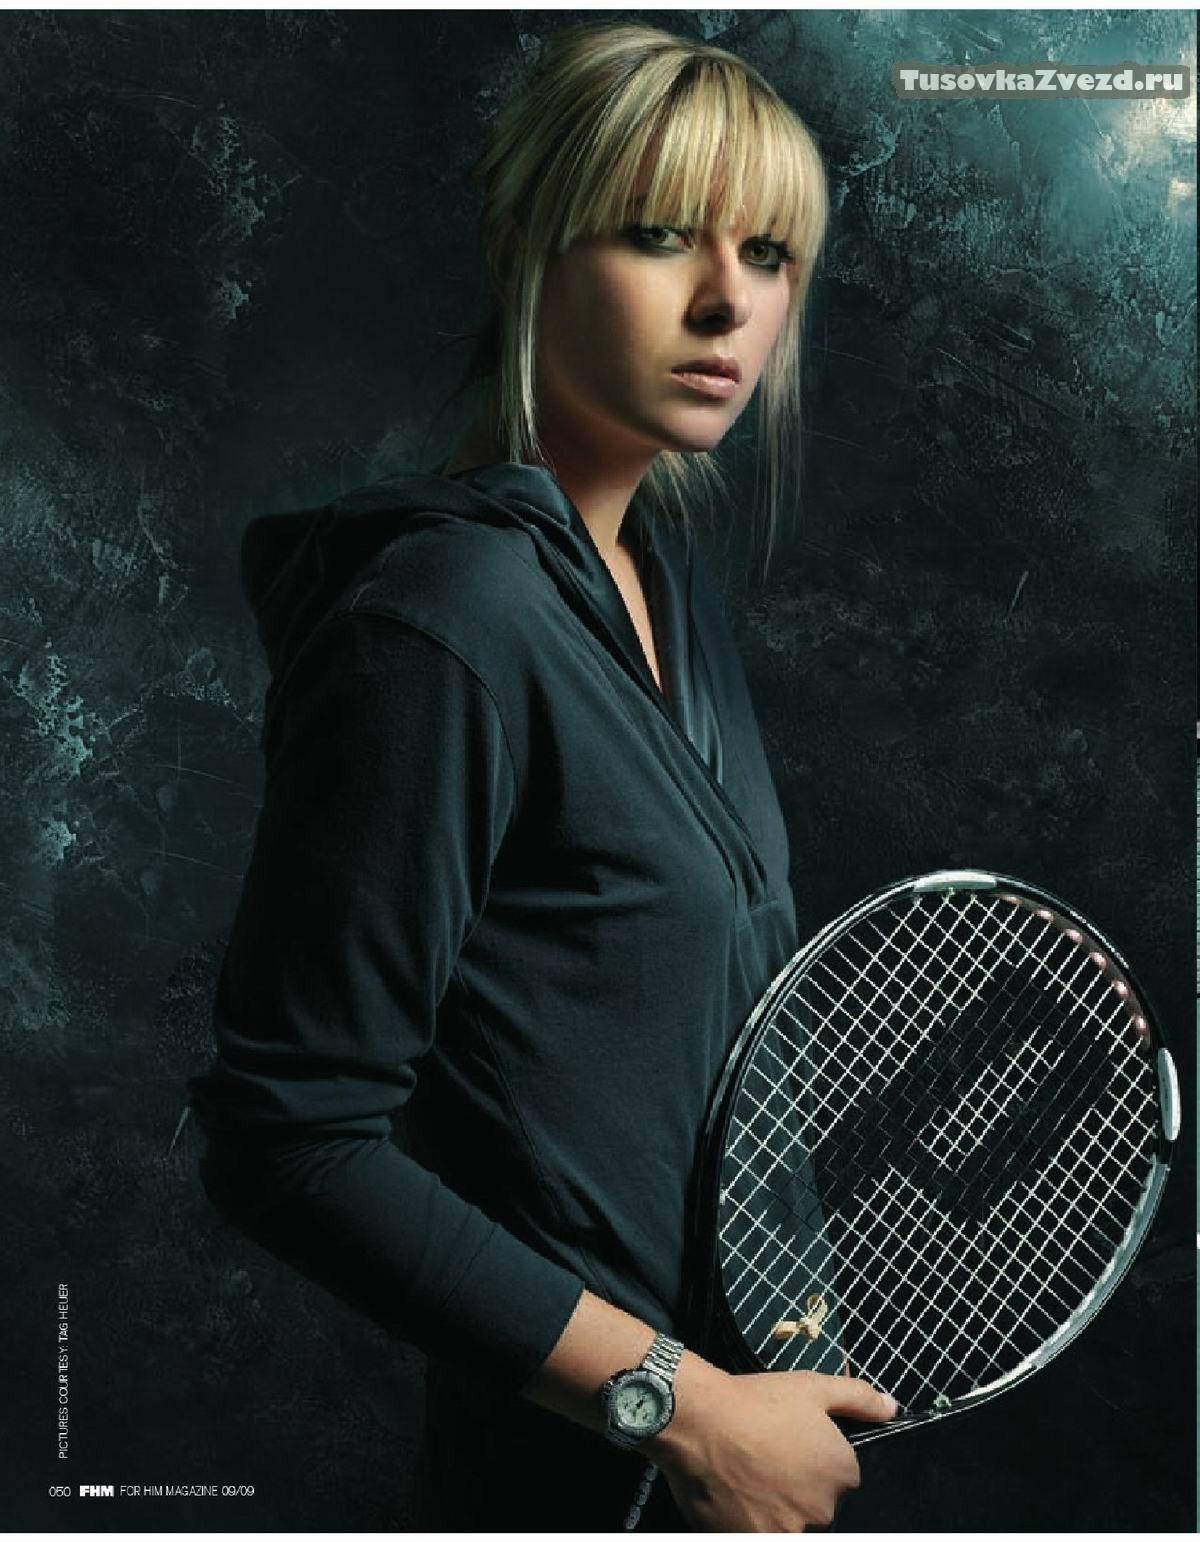 Мария Шарапова (Maria Sharapova) фото в журнале FHM Индия, октябрь 2009